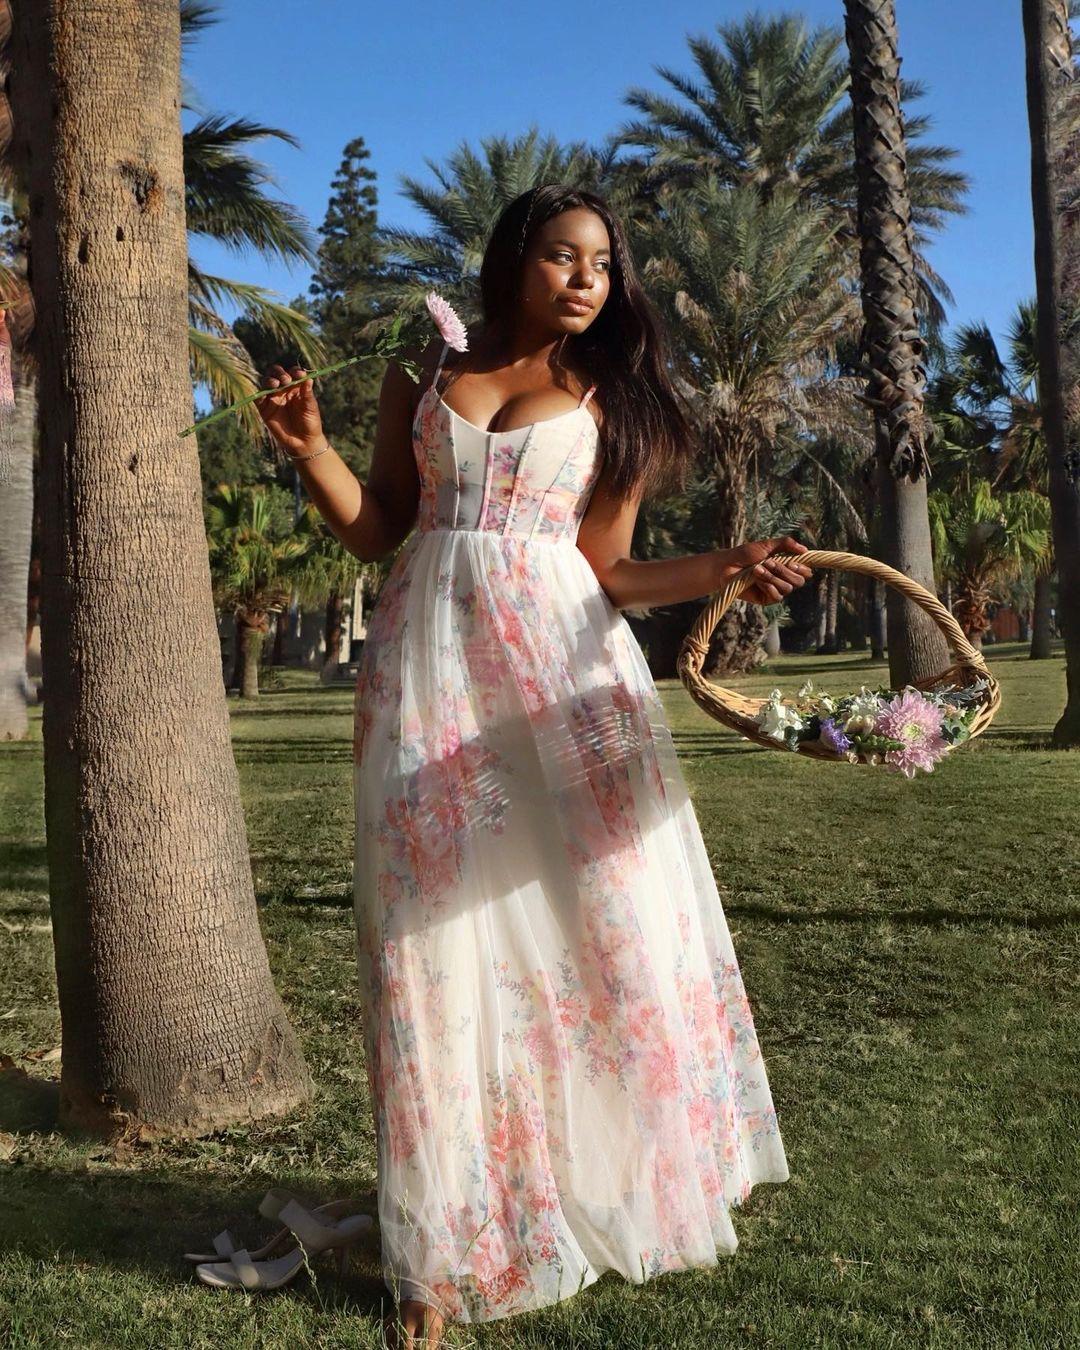 Kaye Bassey in a BCBG floral maxi dress at the park